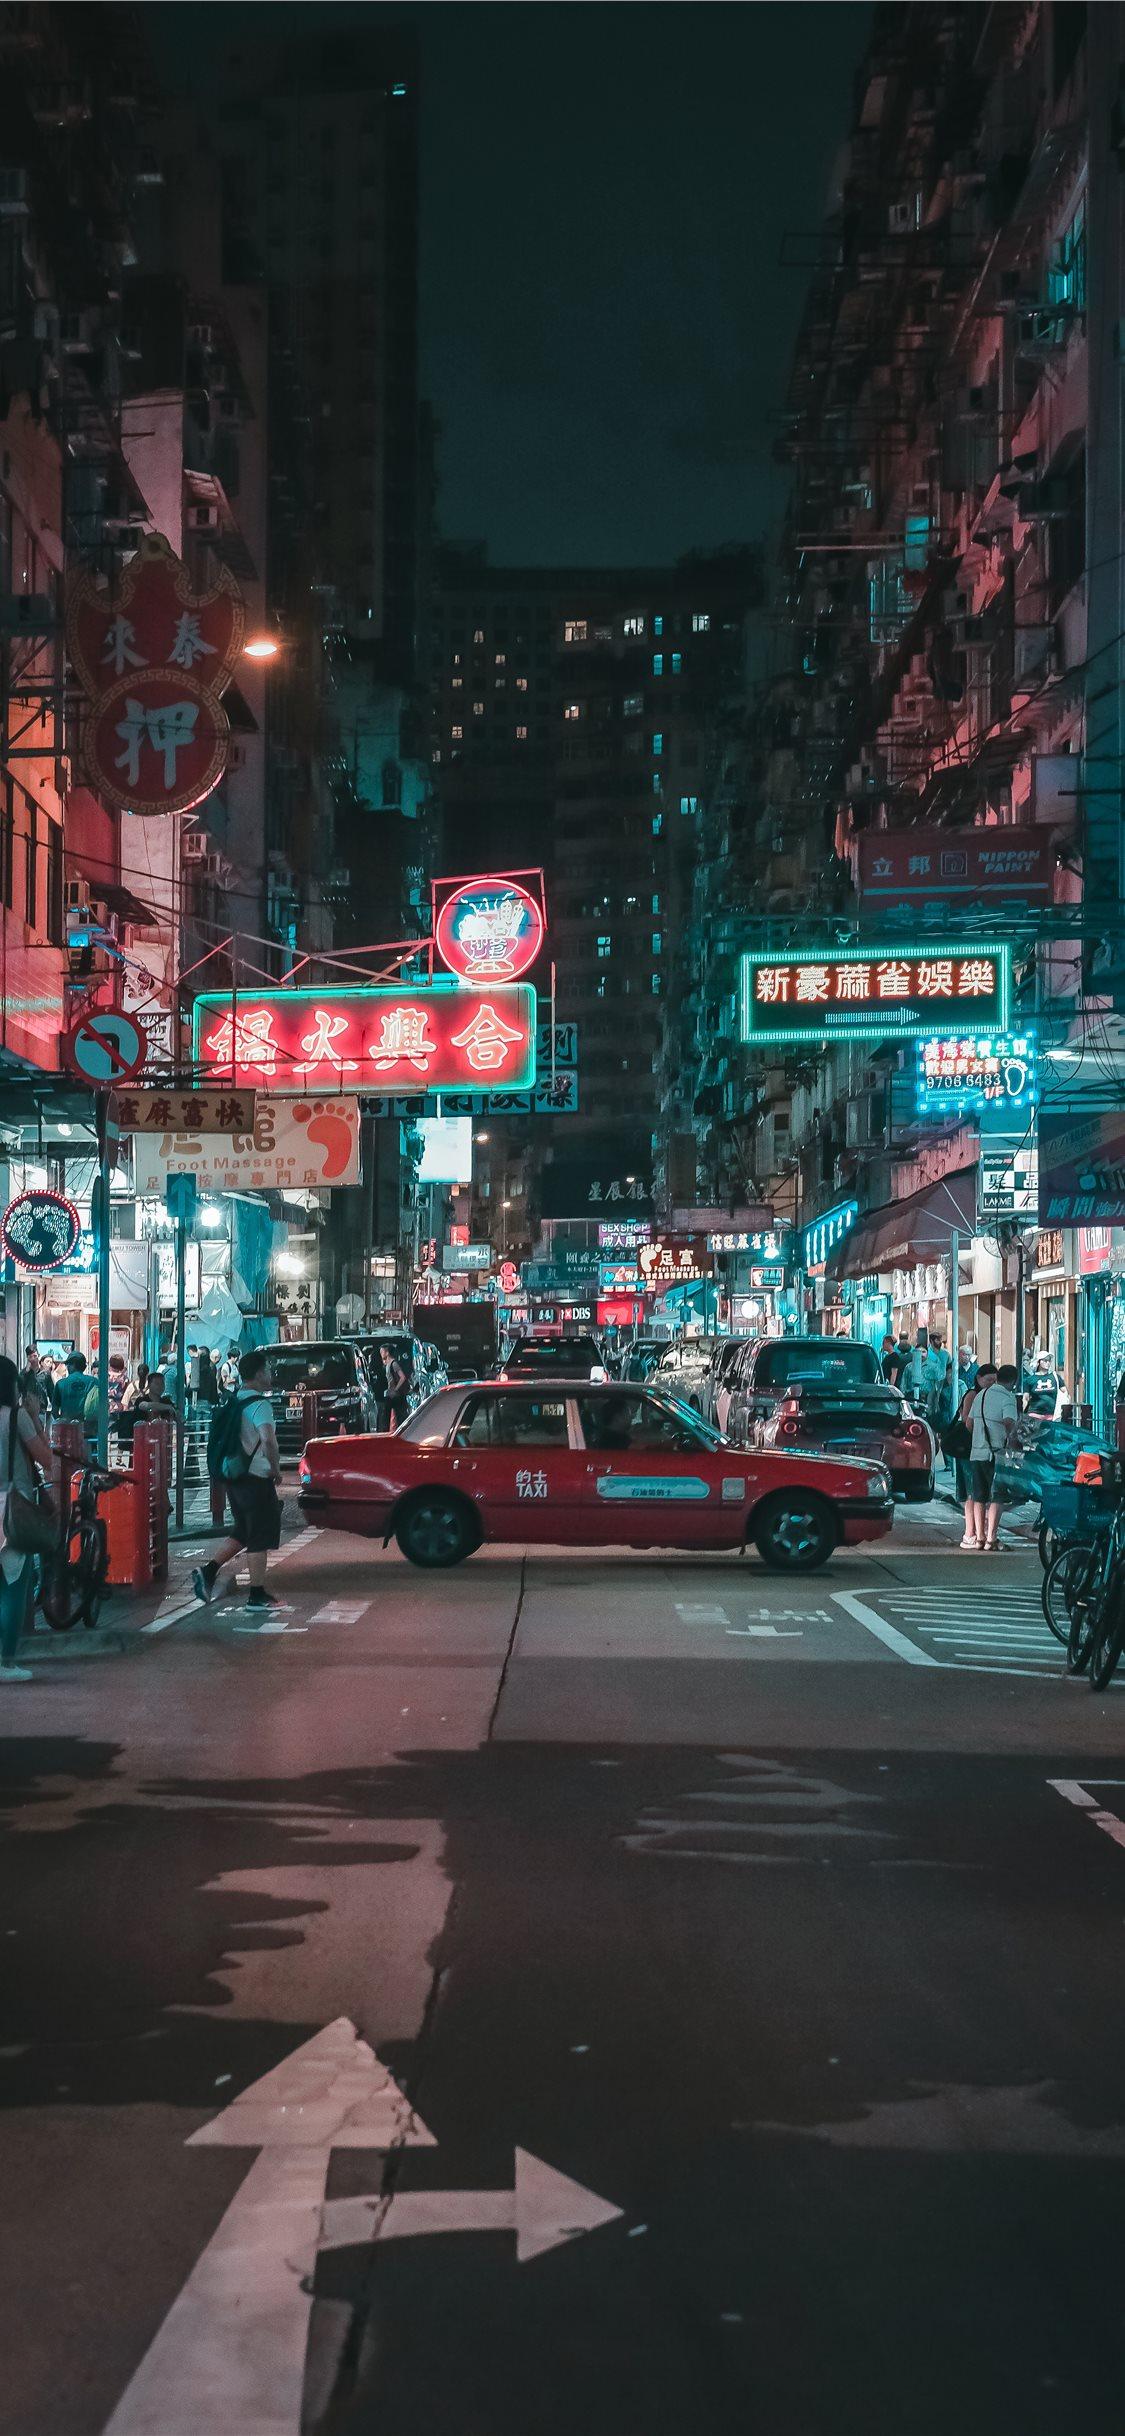 Yau Ma Tei Kowloon Hong Kong Iphone X Wallpapers Free Download